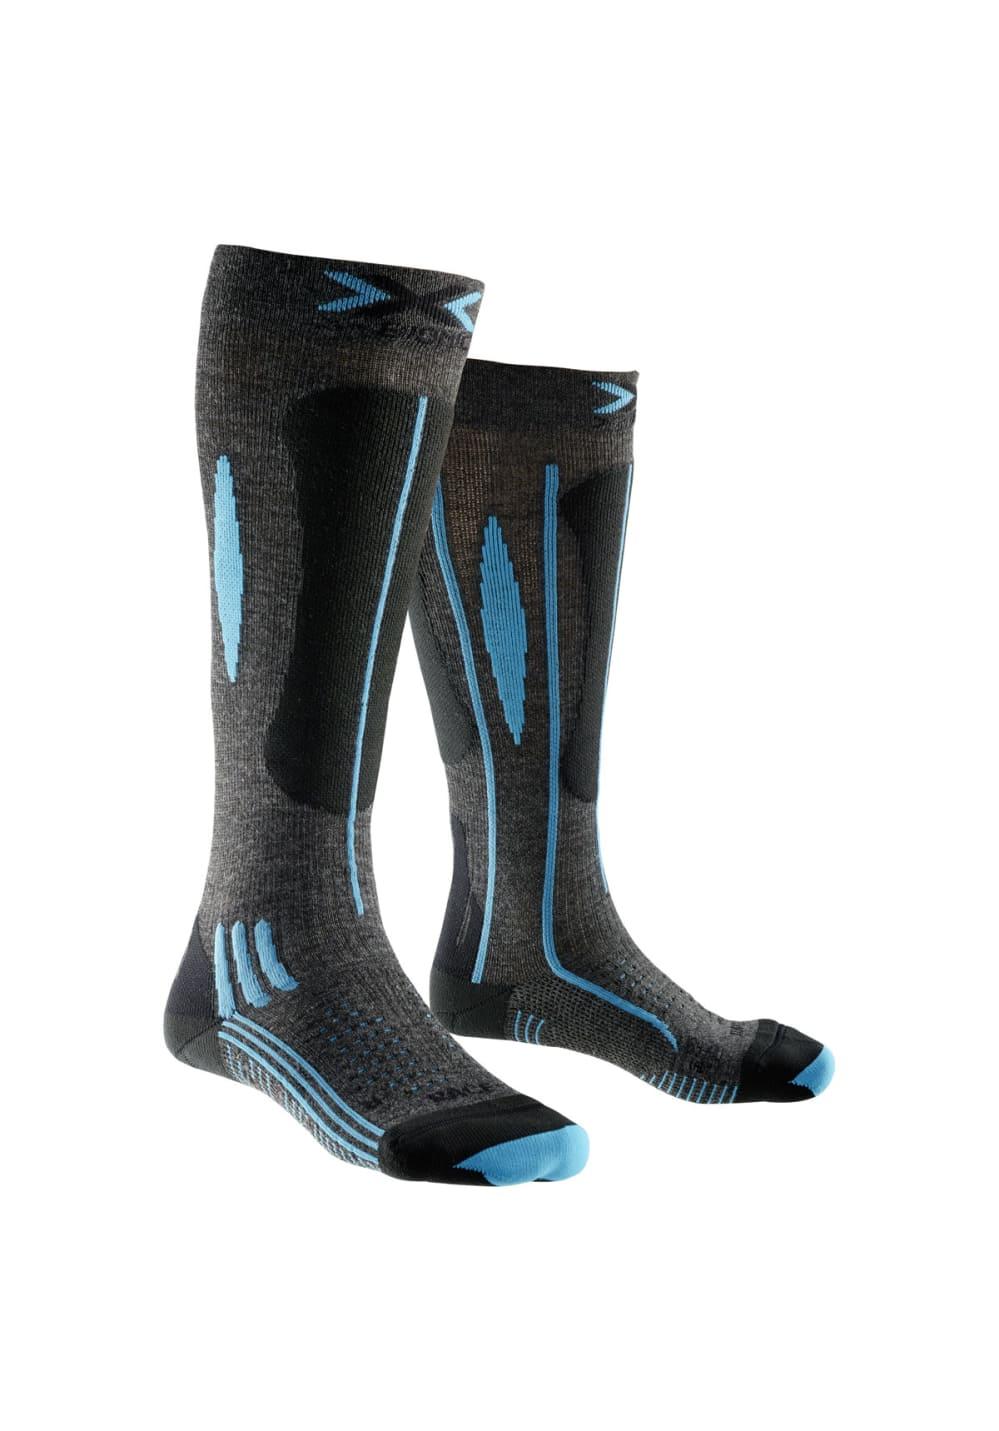 X-Bionic Ski Effektor Race Wintersport - Grau, Gr. 39-40